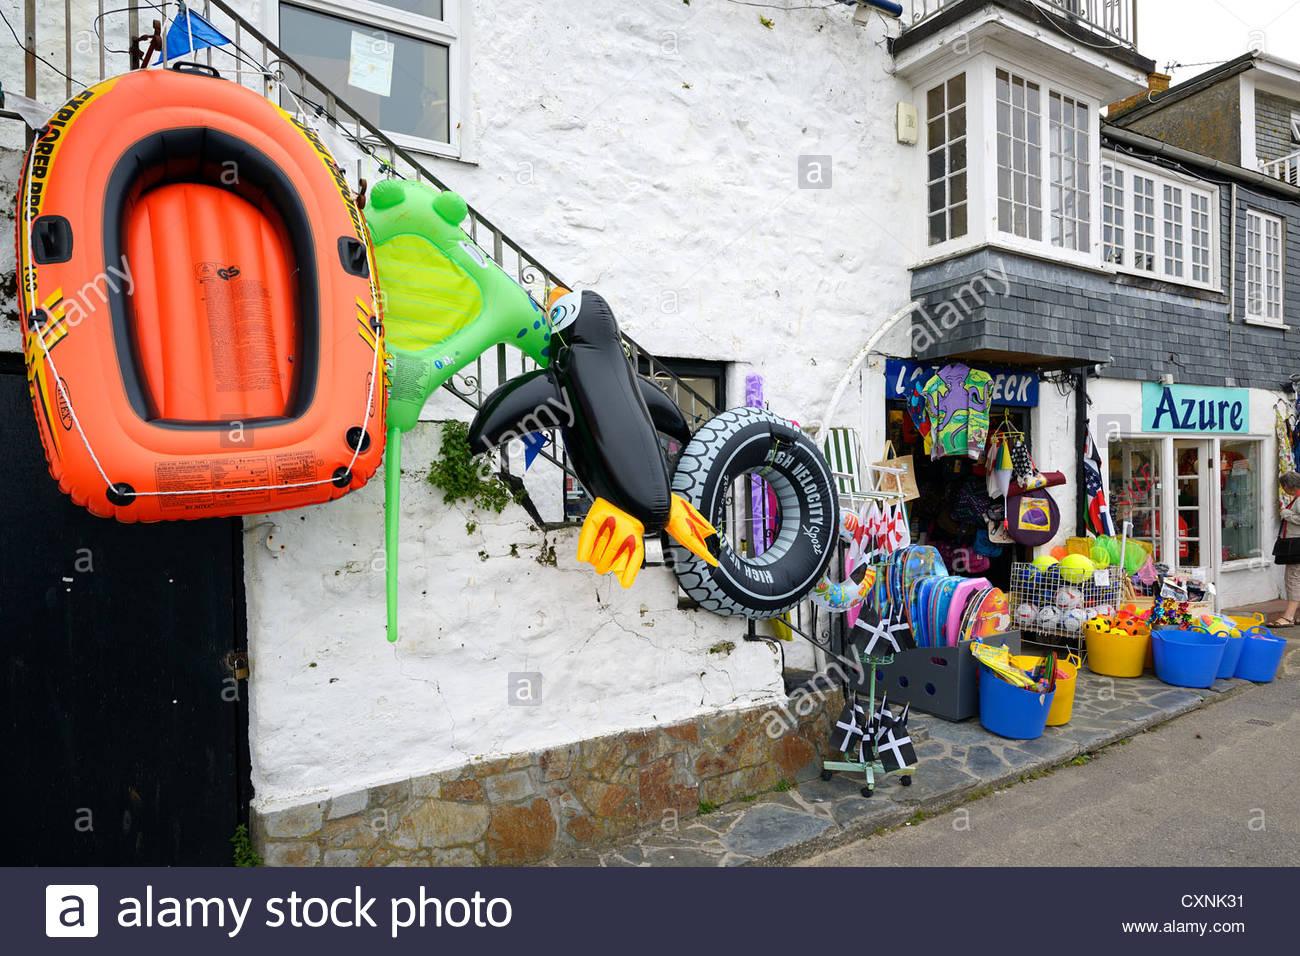 Beach toys on sale, St Ives, Cornwall, England Stock Photo